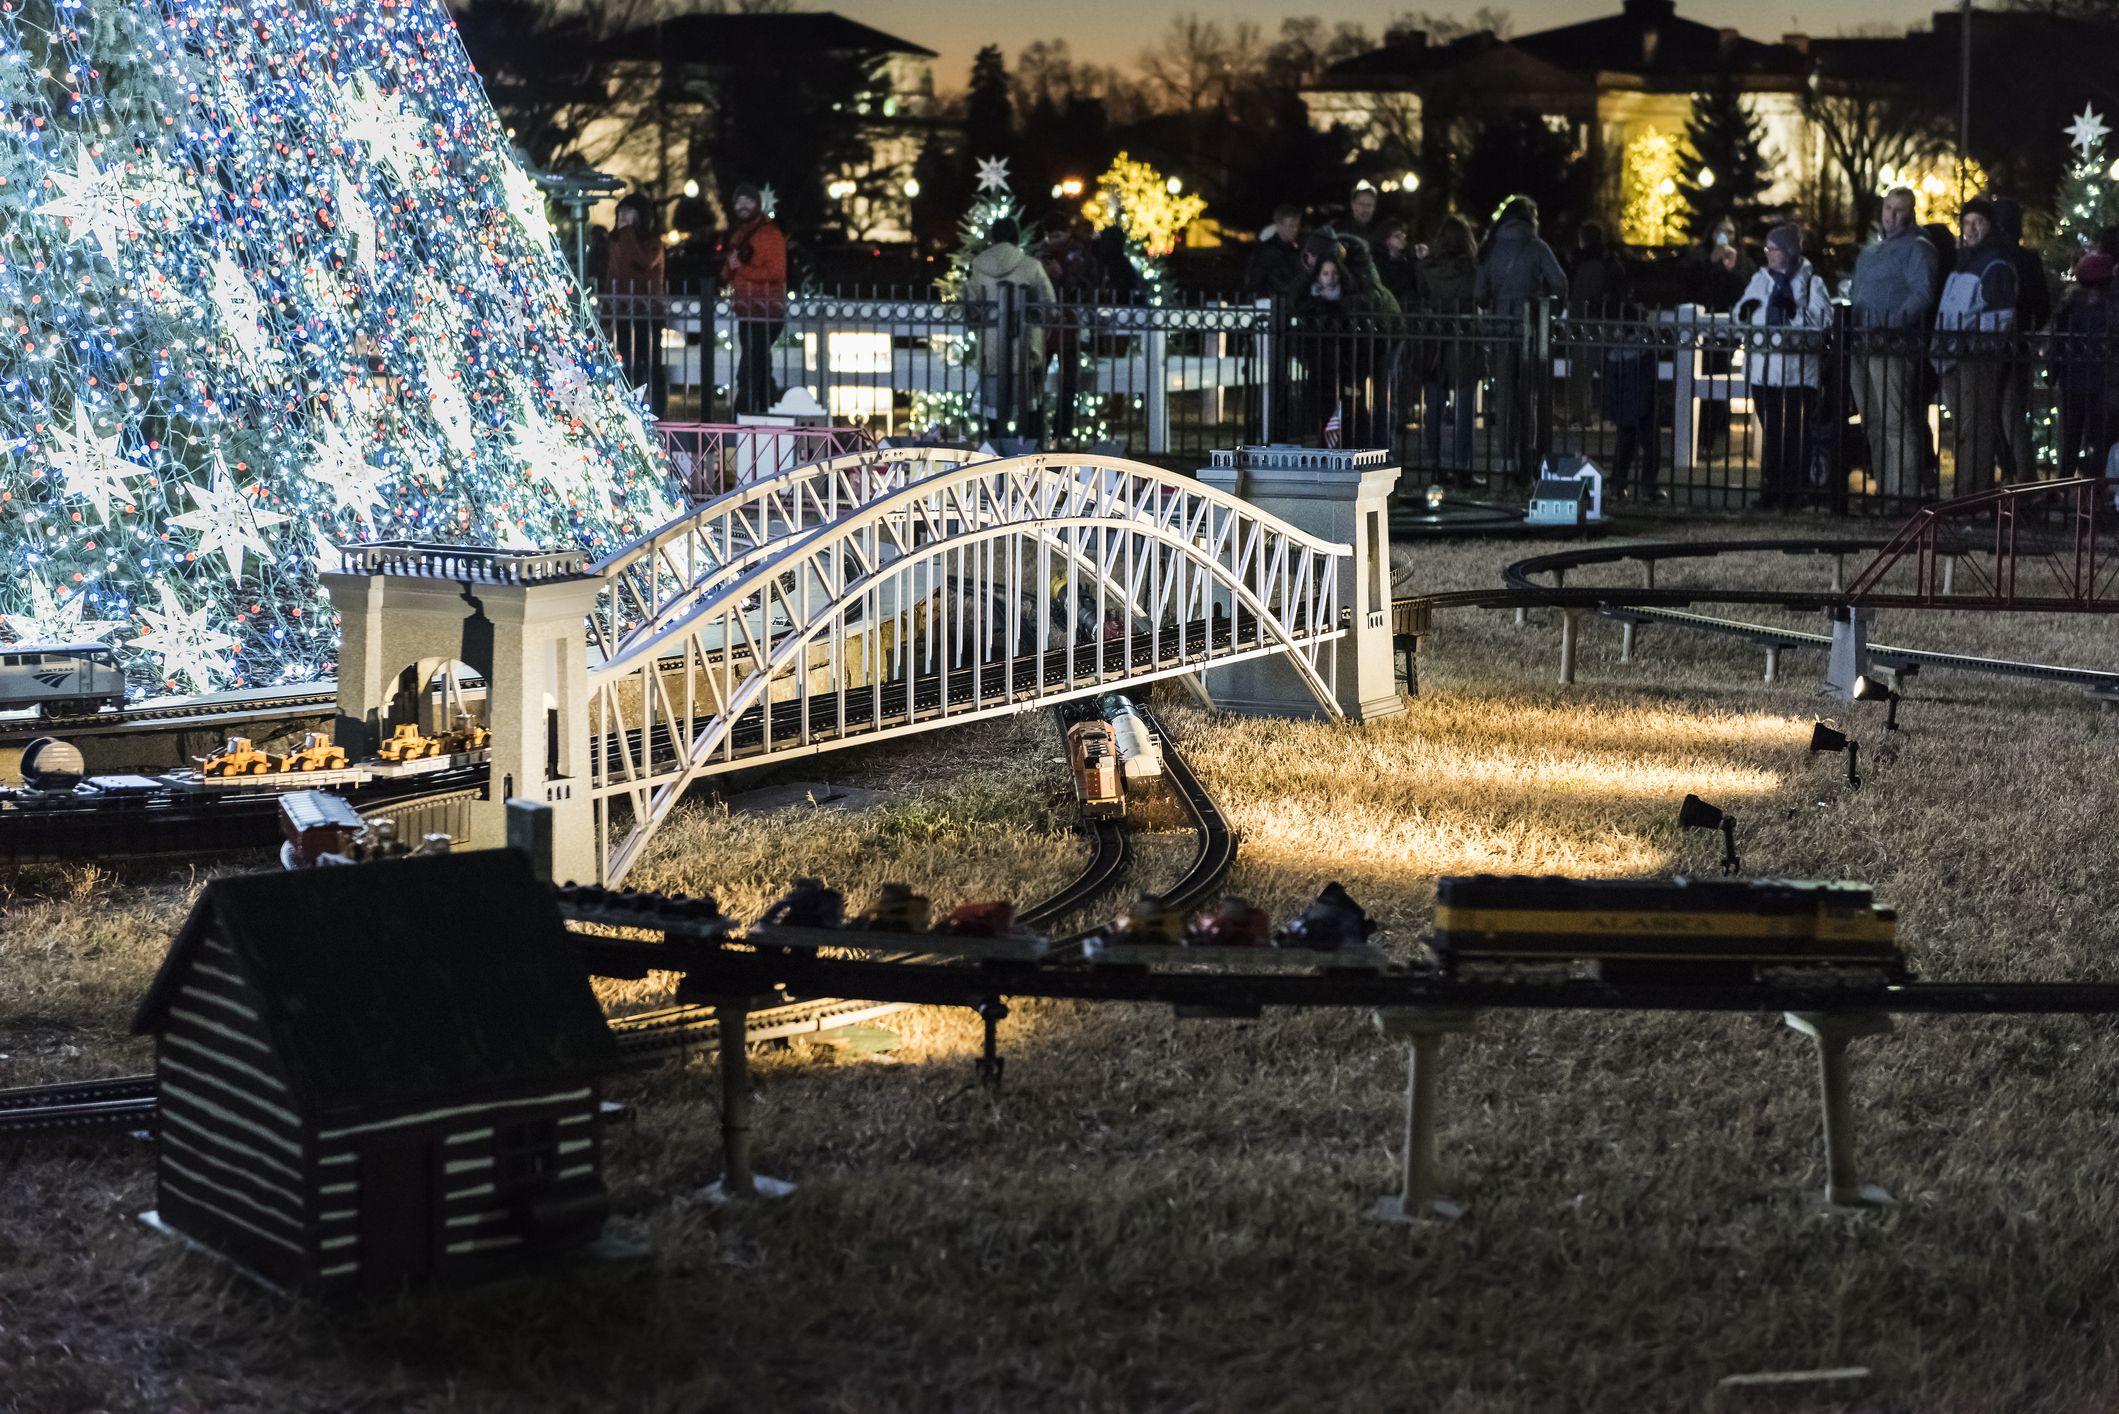 Christmas Model Train Displays Near Washington D C